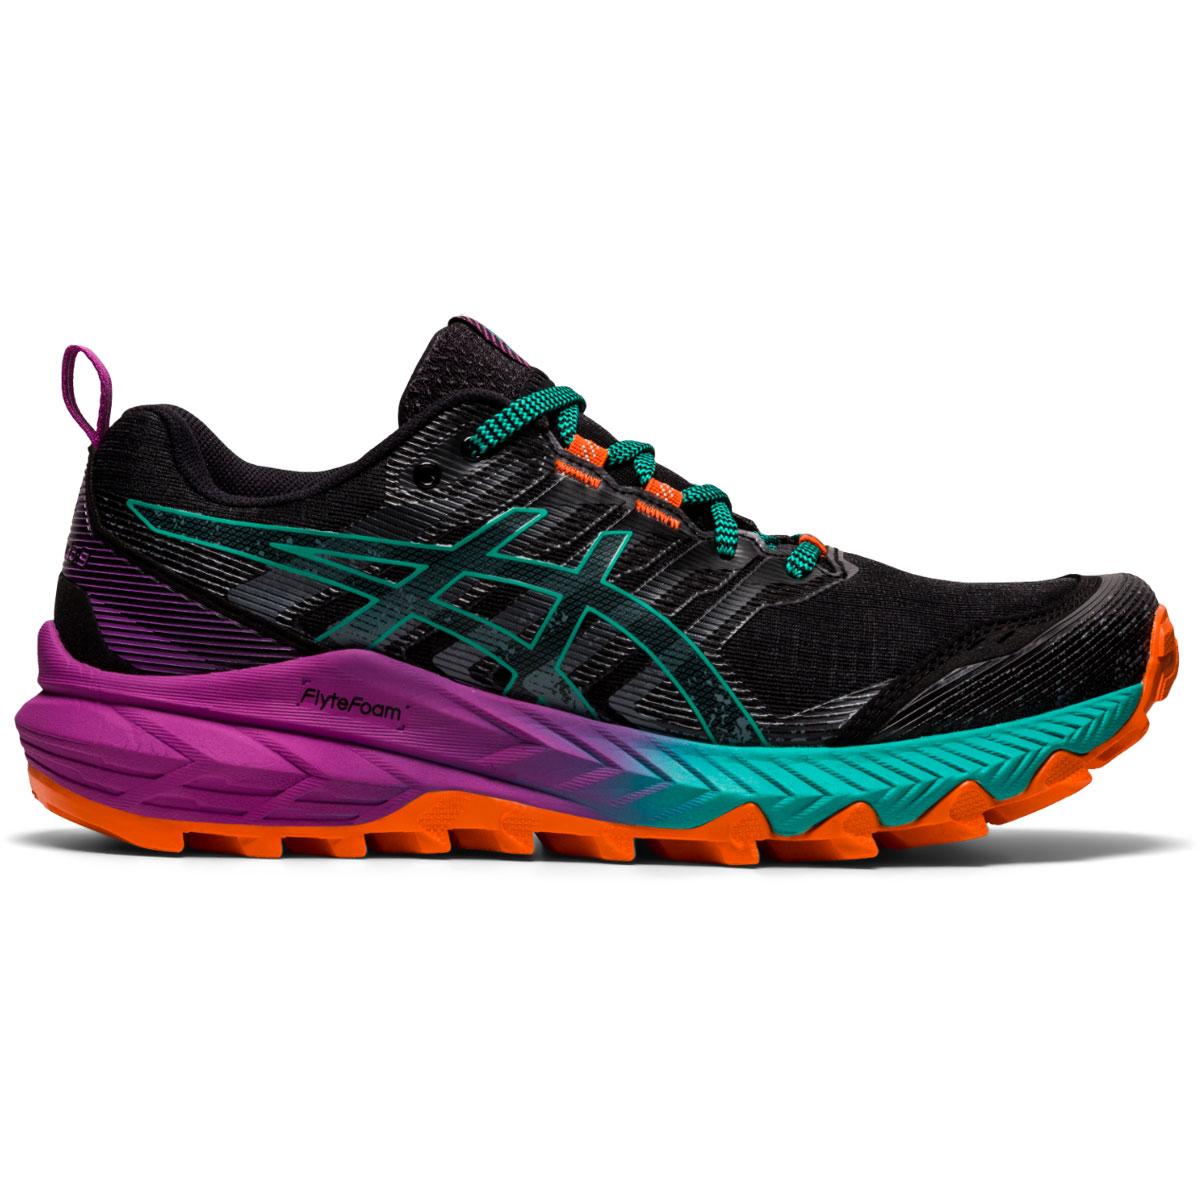 Women's Asics Gel-Trabuco 9 Running Shoe - Color: Black/Baltic Jewel - Size: 5 - Width: Regular, Black/Baltic Jewel, large, image 1